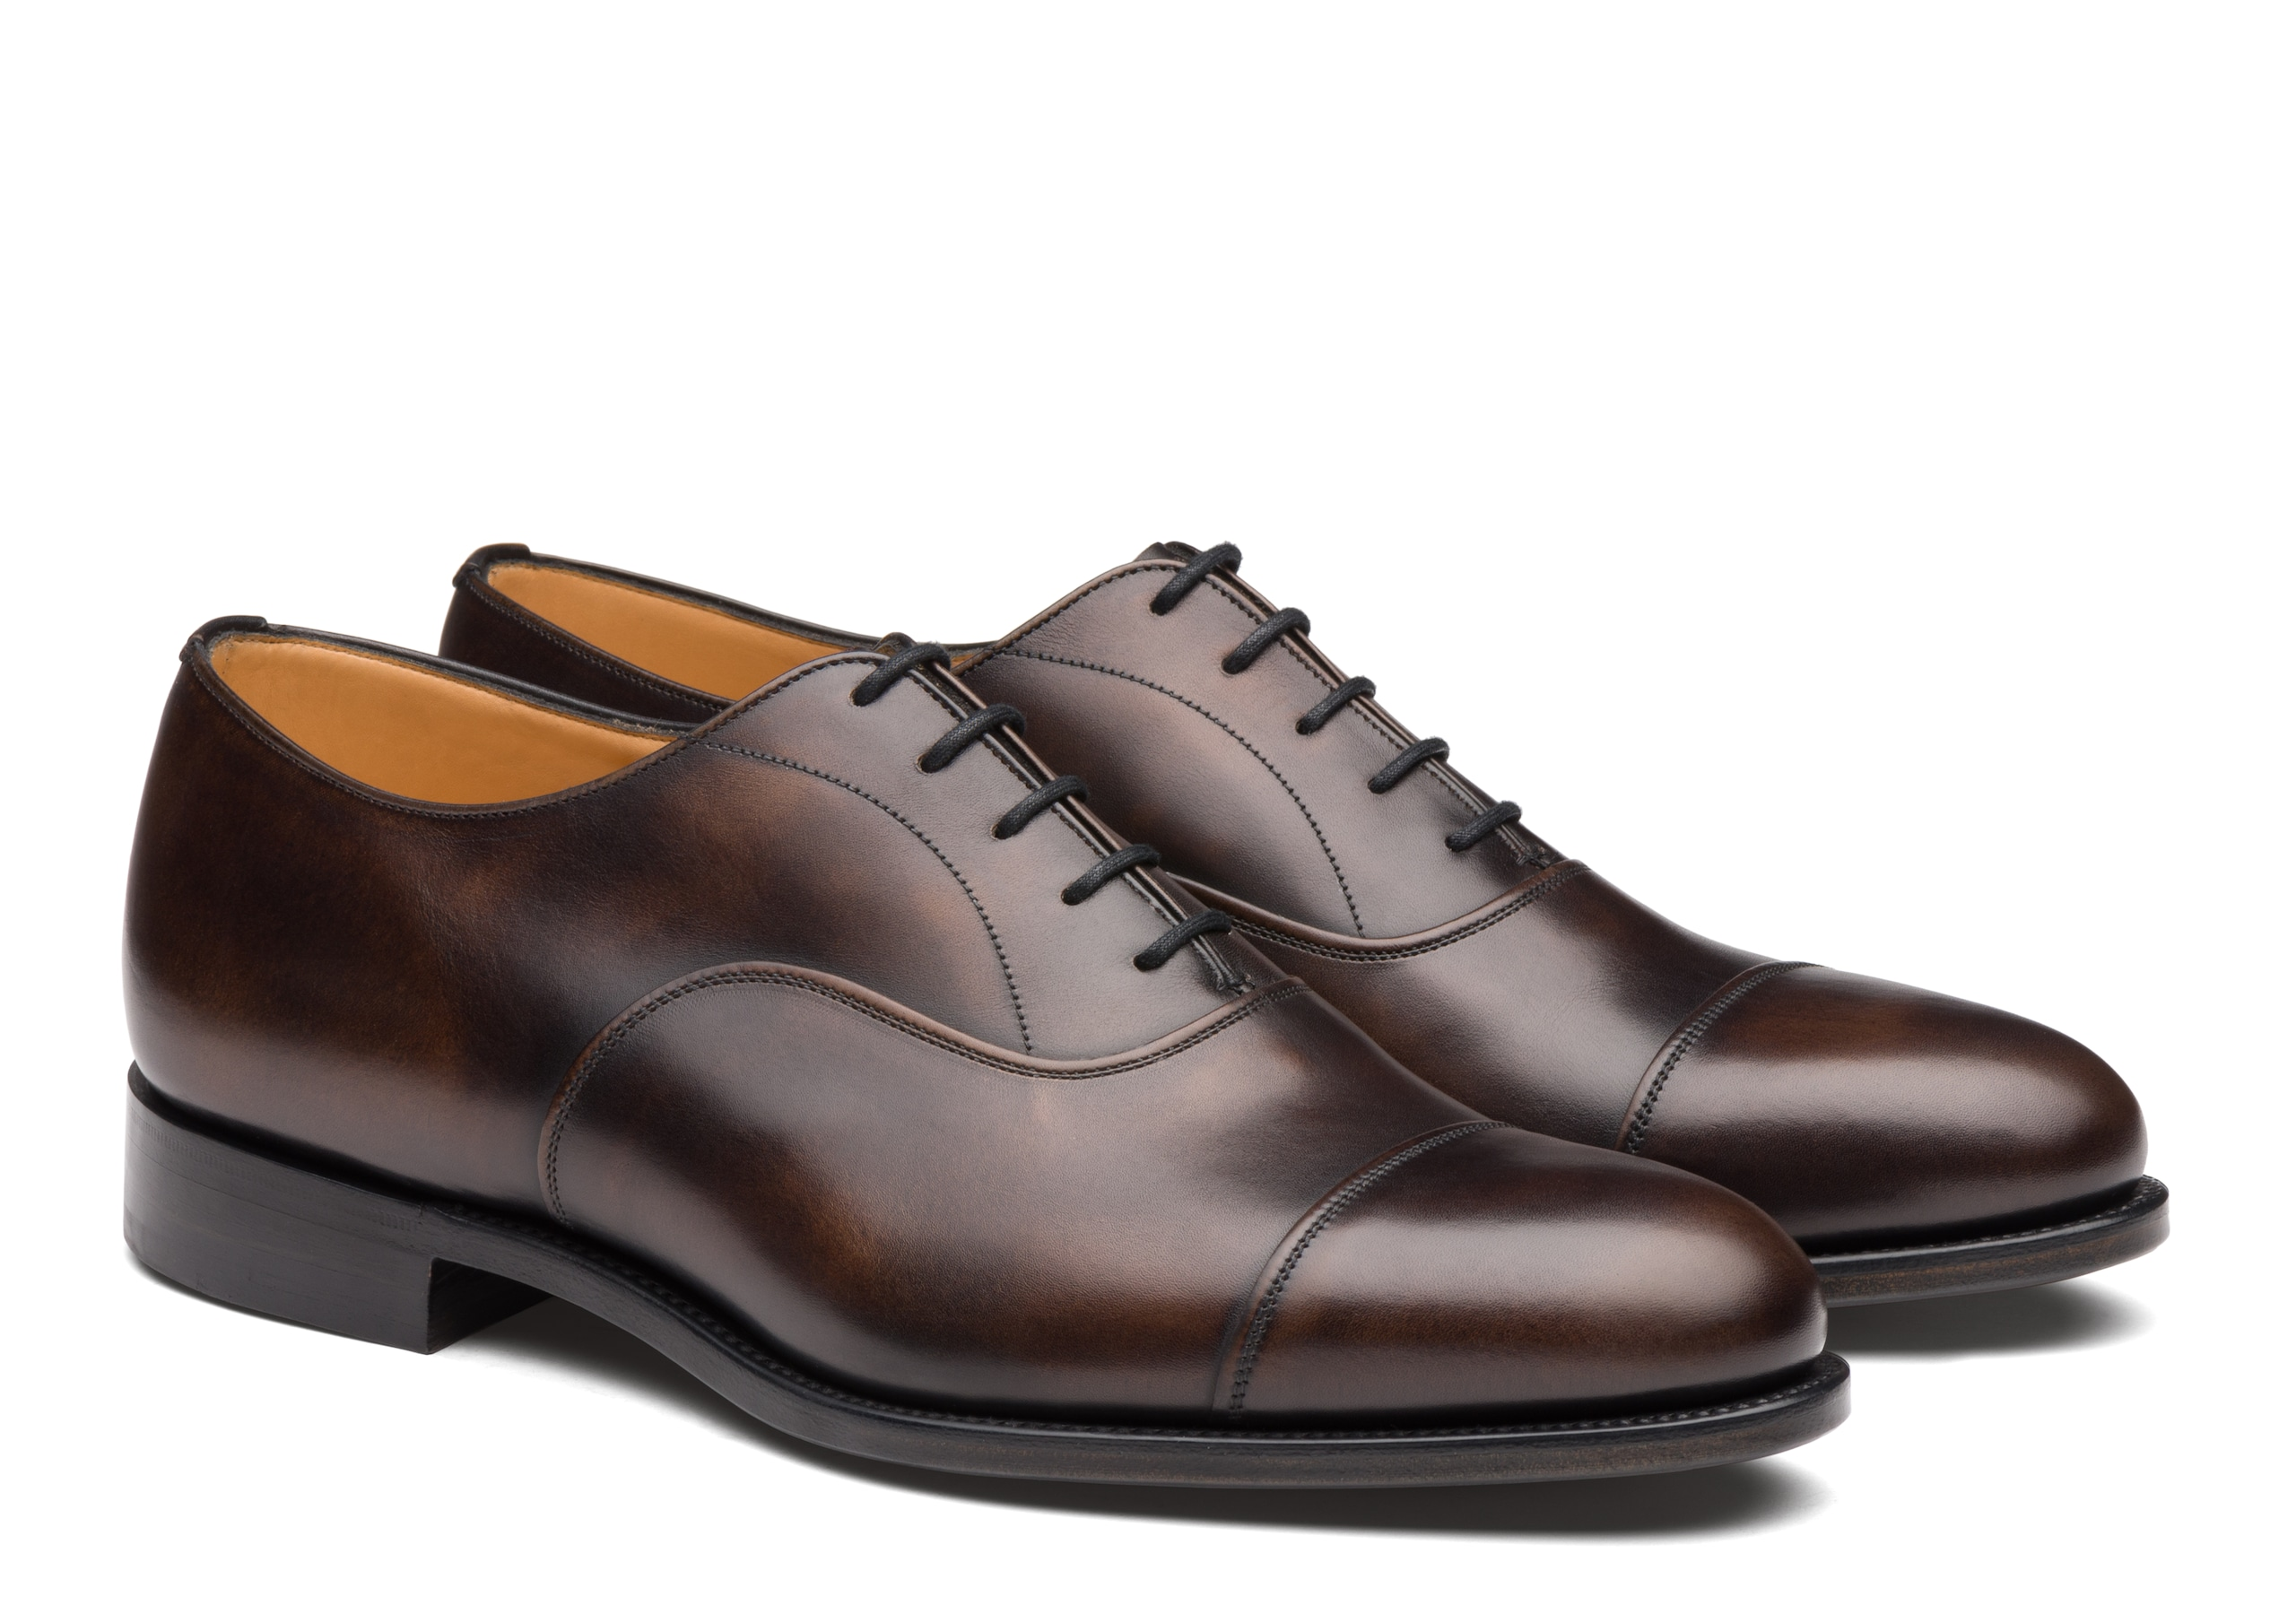 Prince Church's Royal Calf Leather Oxford Brown